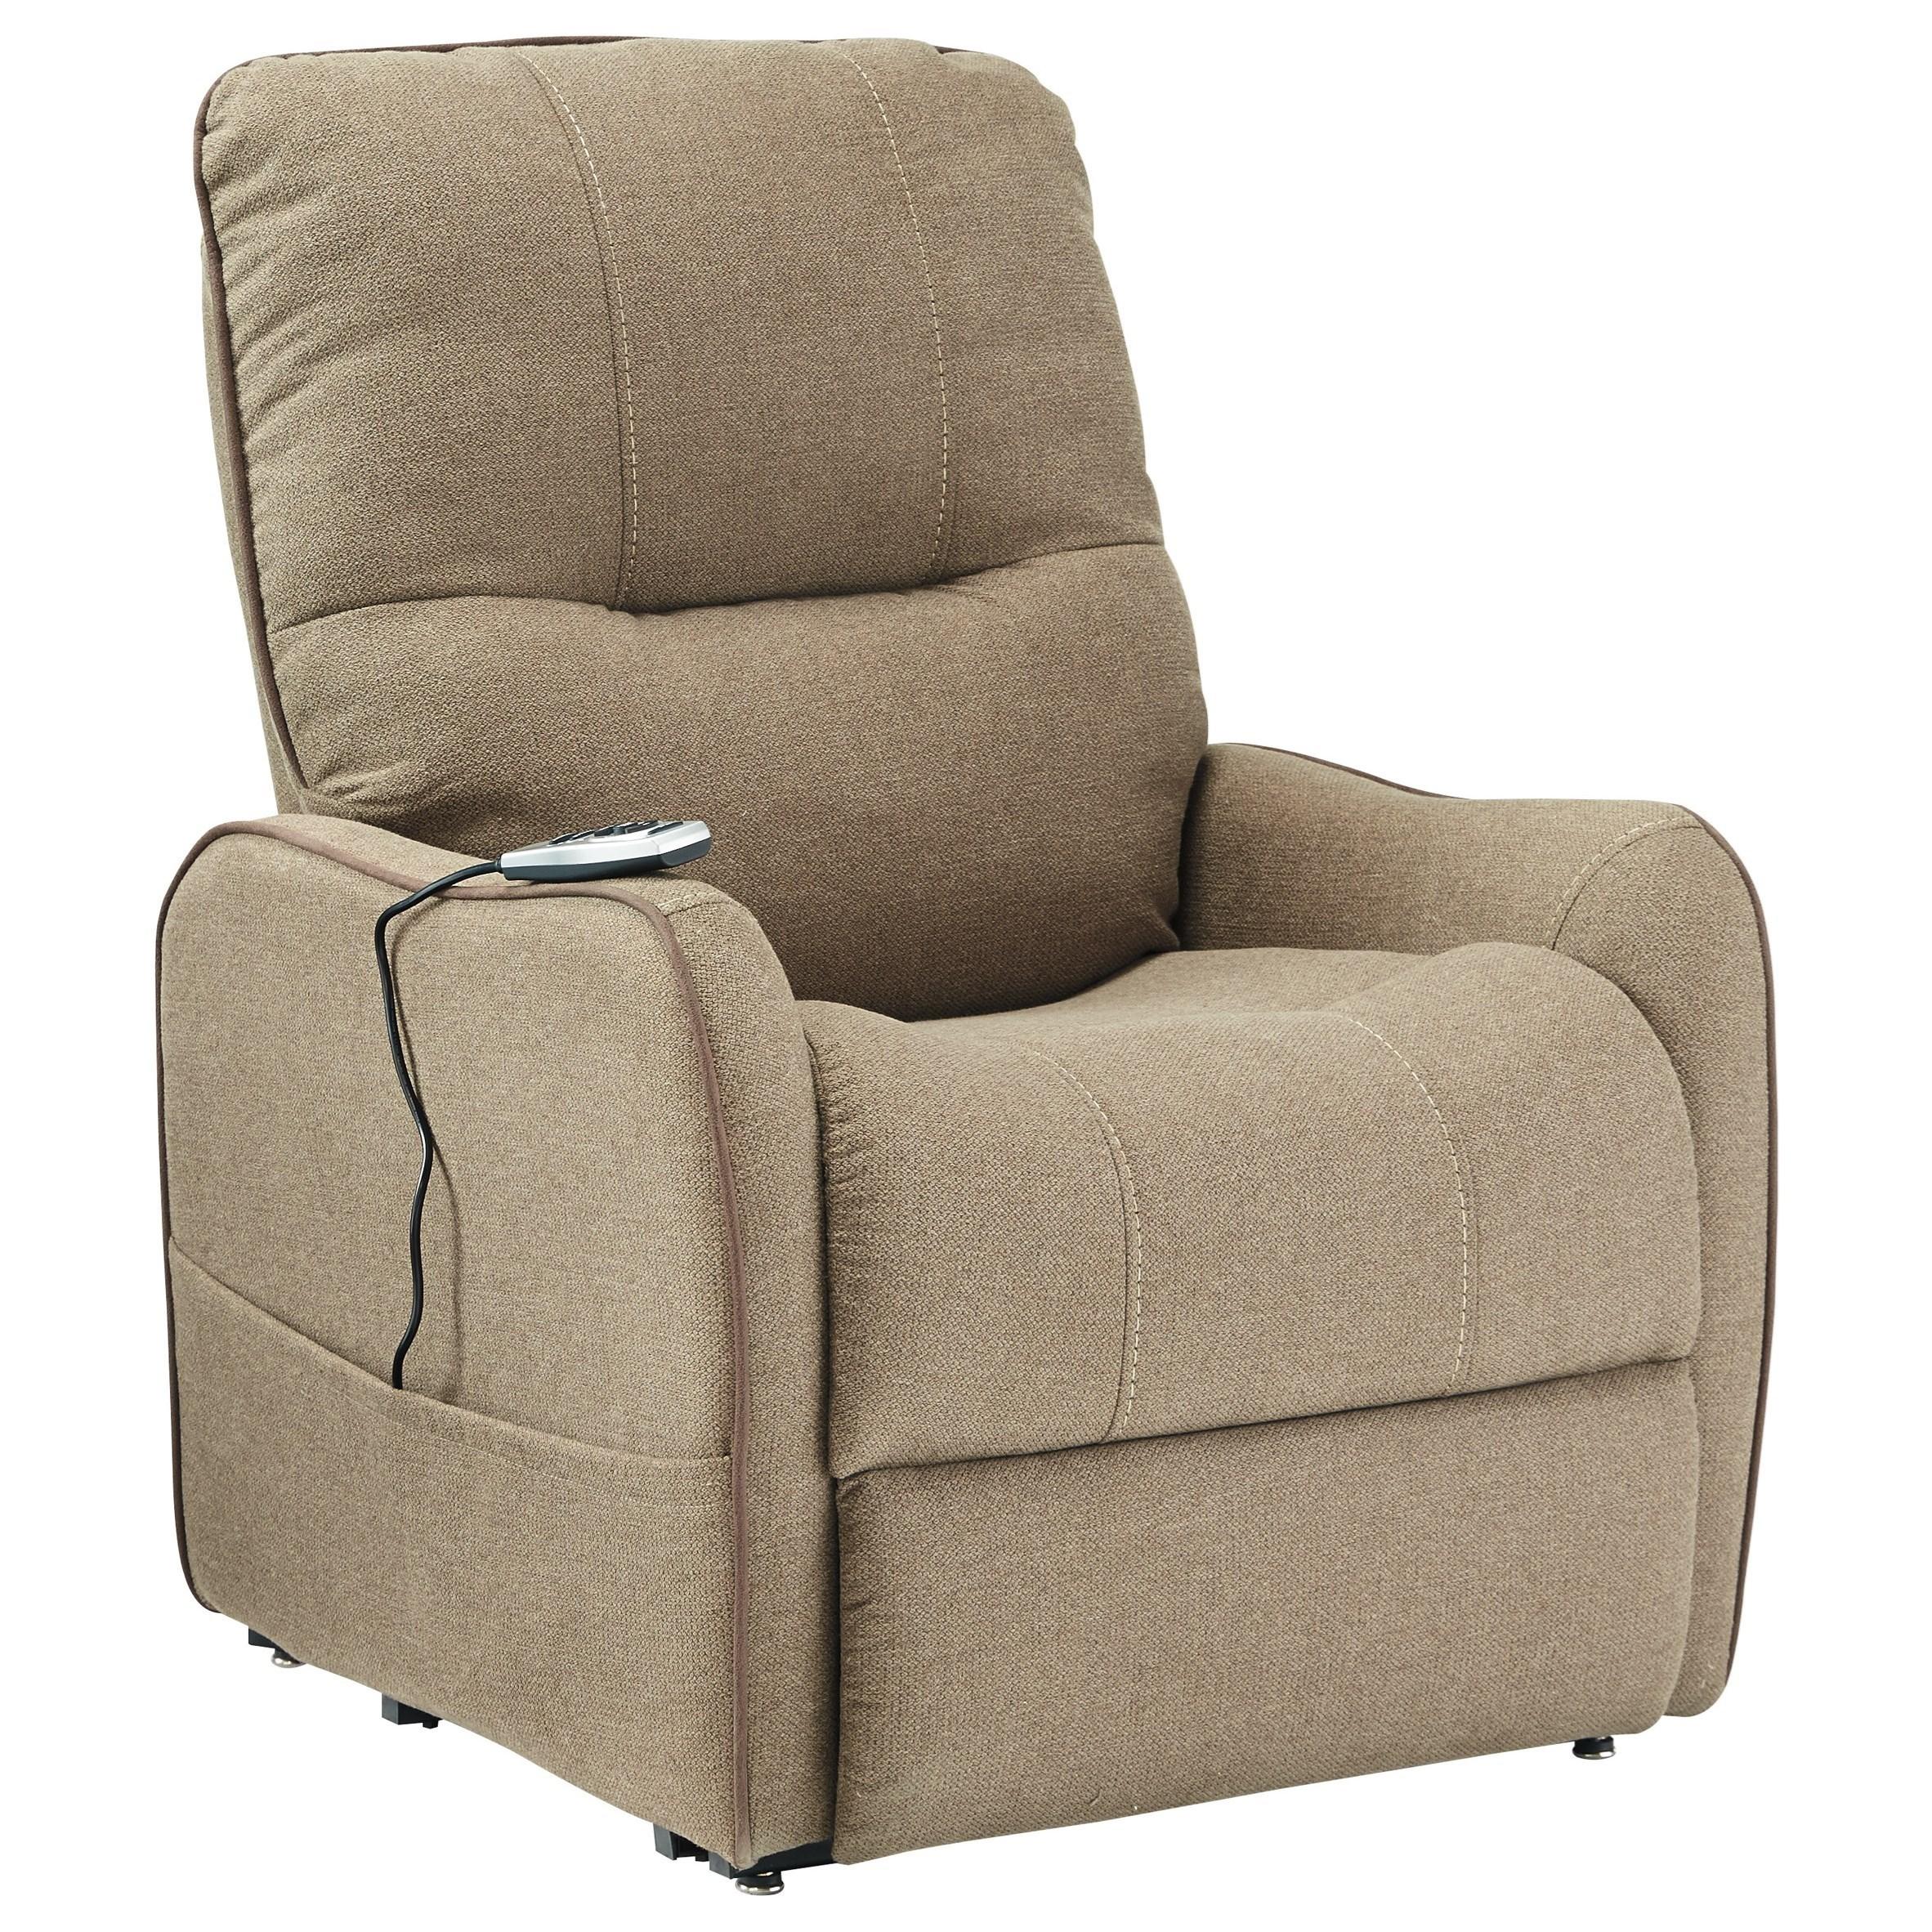 signature design by ashley enjoy 2190212 power lift recliner with rh furnitureappliancemart com ashley power lift recliner chair